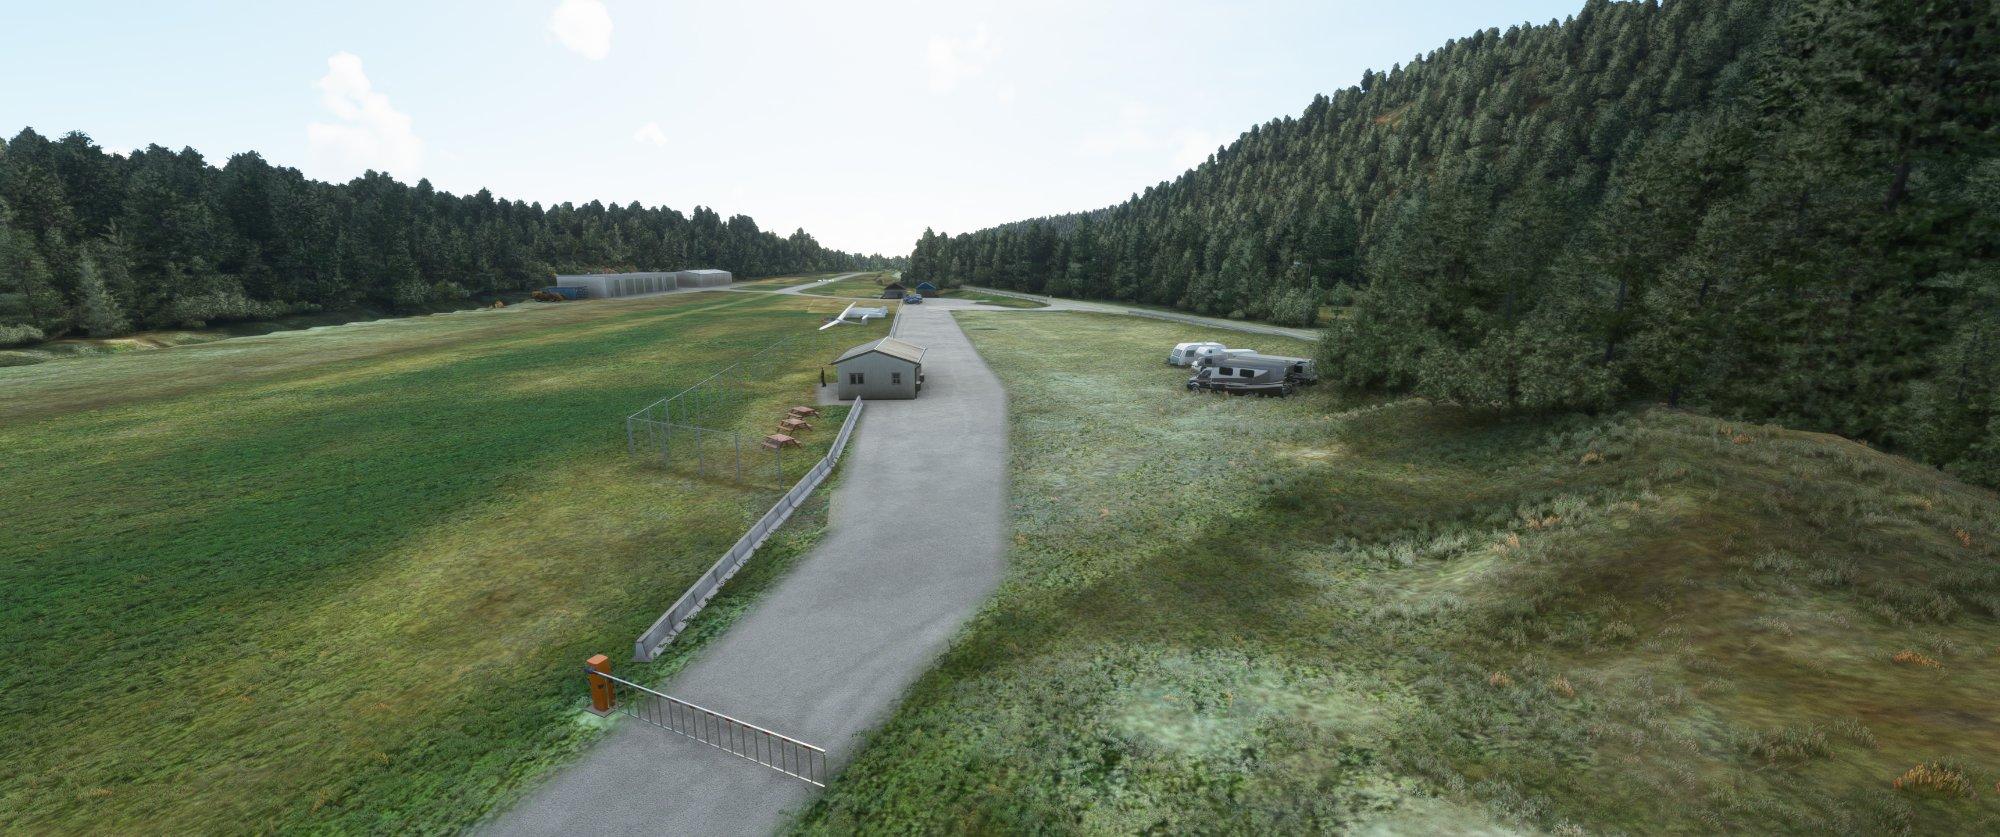 Microsoft Flight Simulator Screenshot 2021.05.01 - 23.04.59.18.jpg